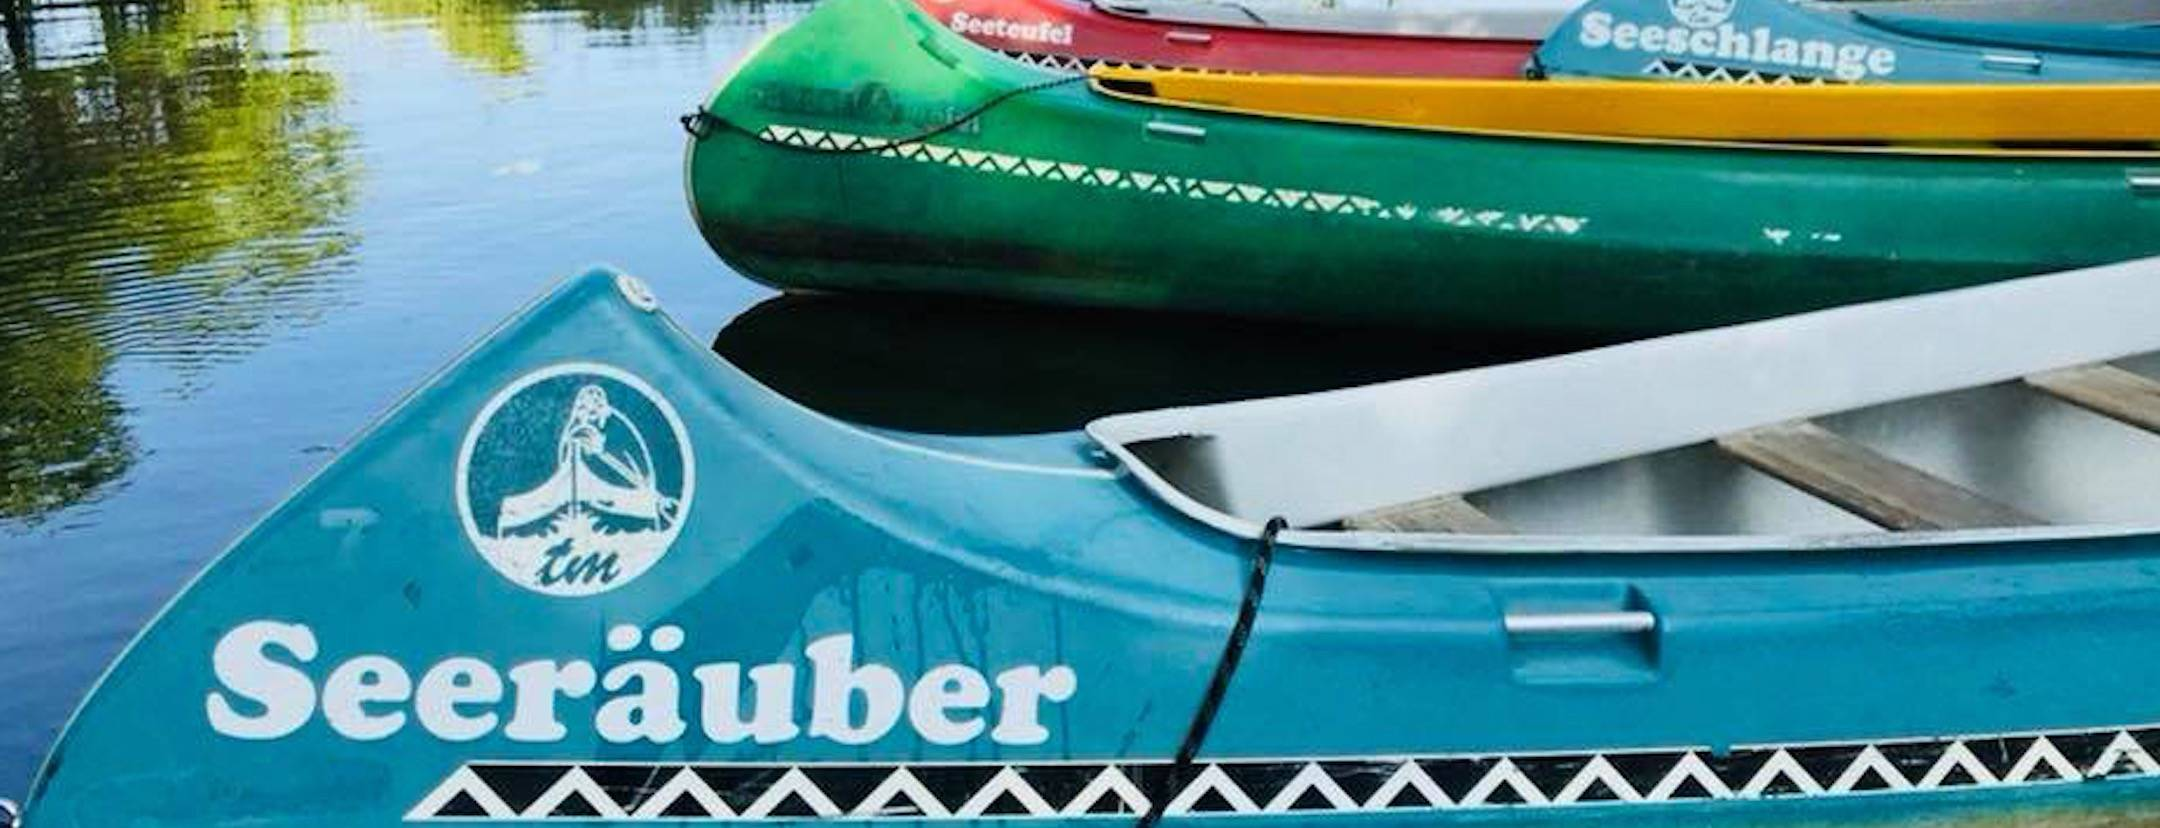 Gokarthof-Bike-Boat-BBQ-Tour